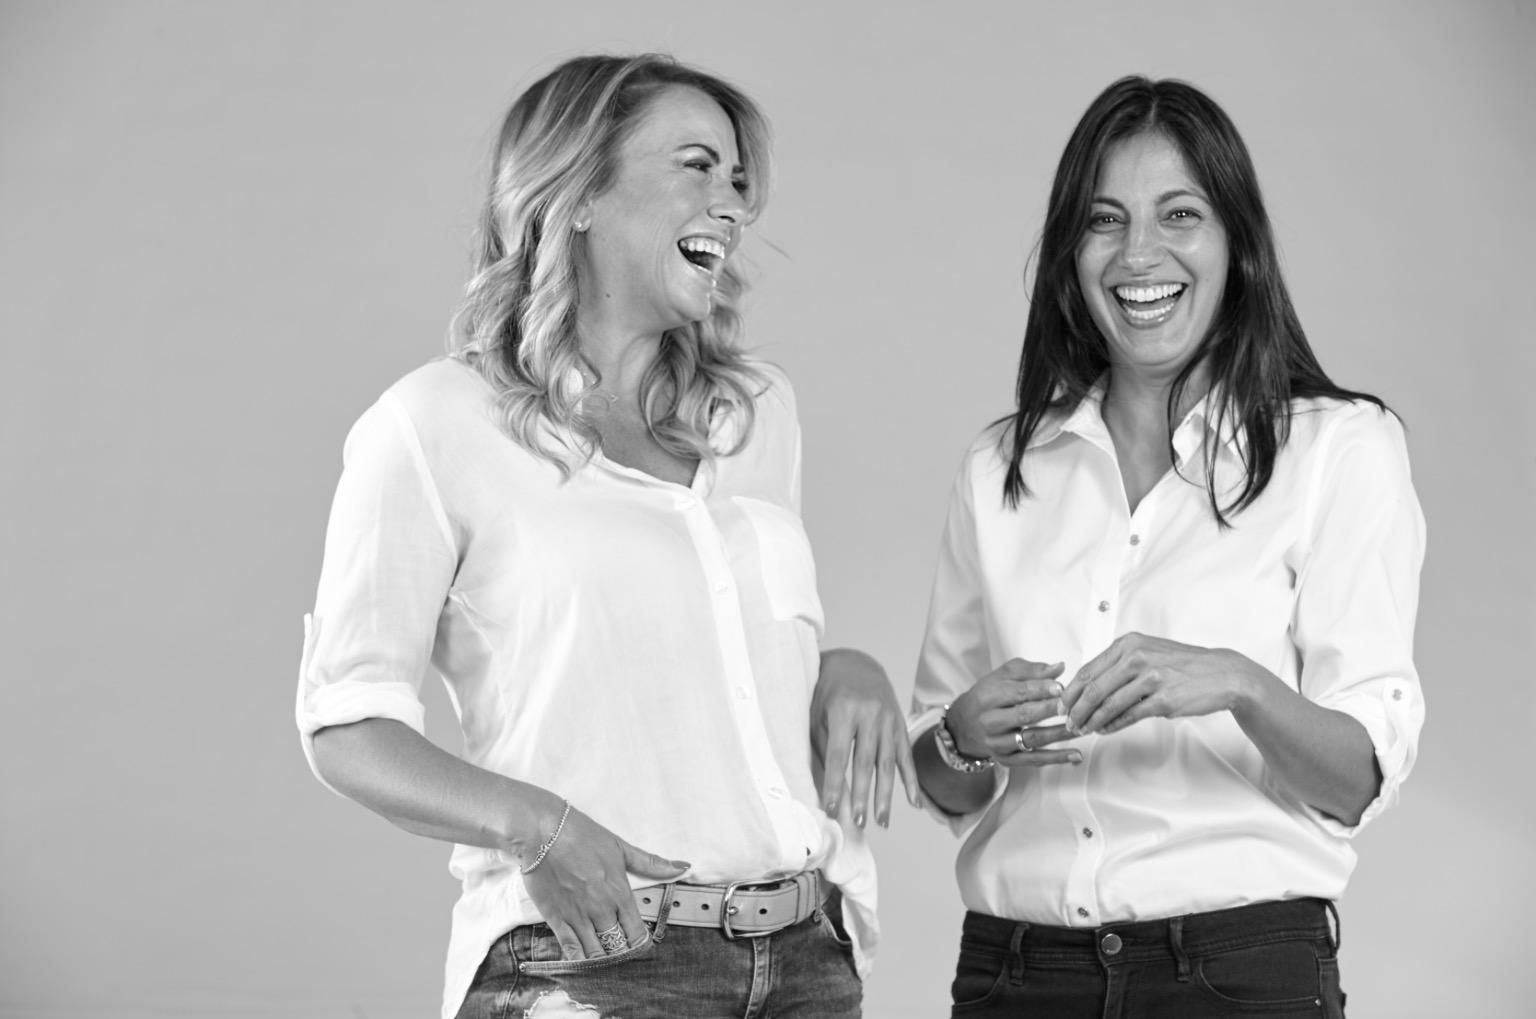 Nadine Landry et Josée Dufresne_CRedit_Tango Photographe